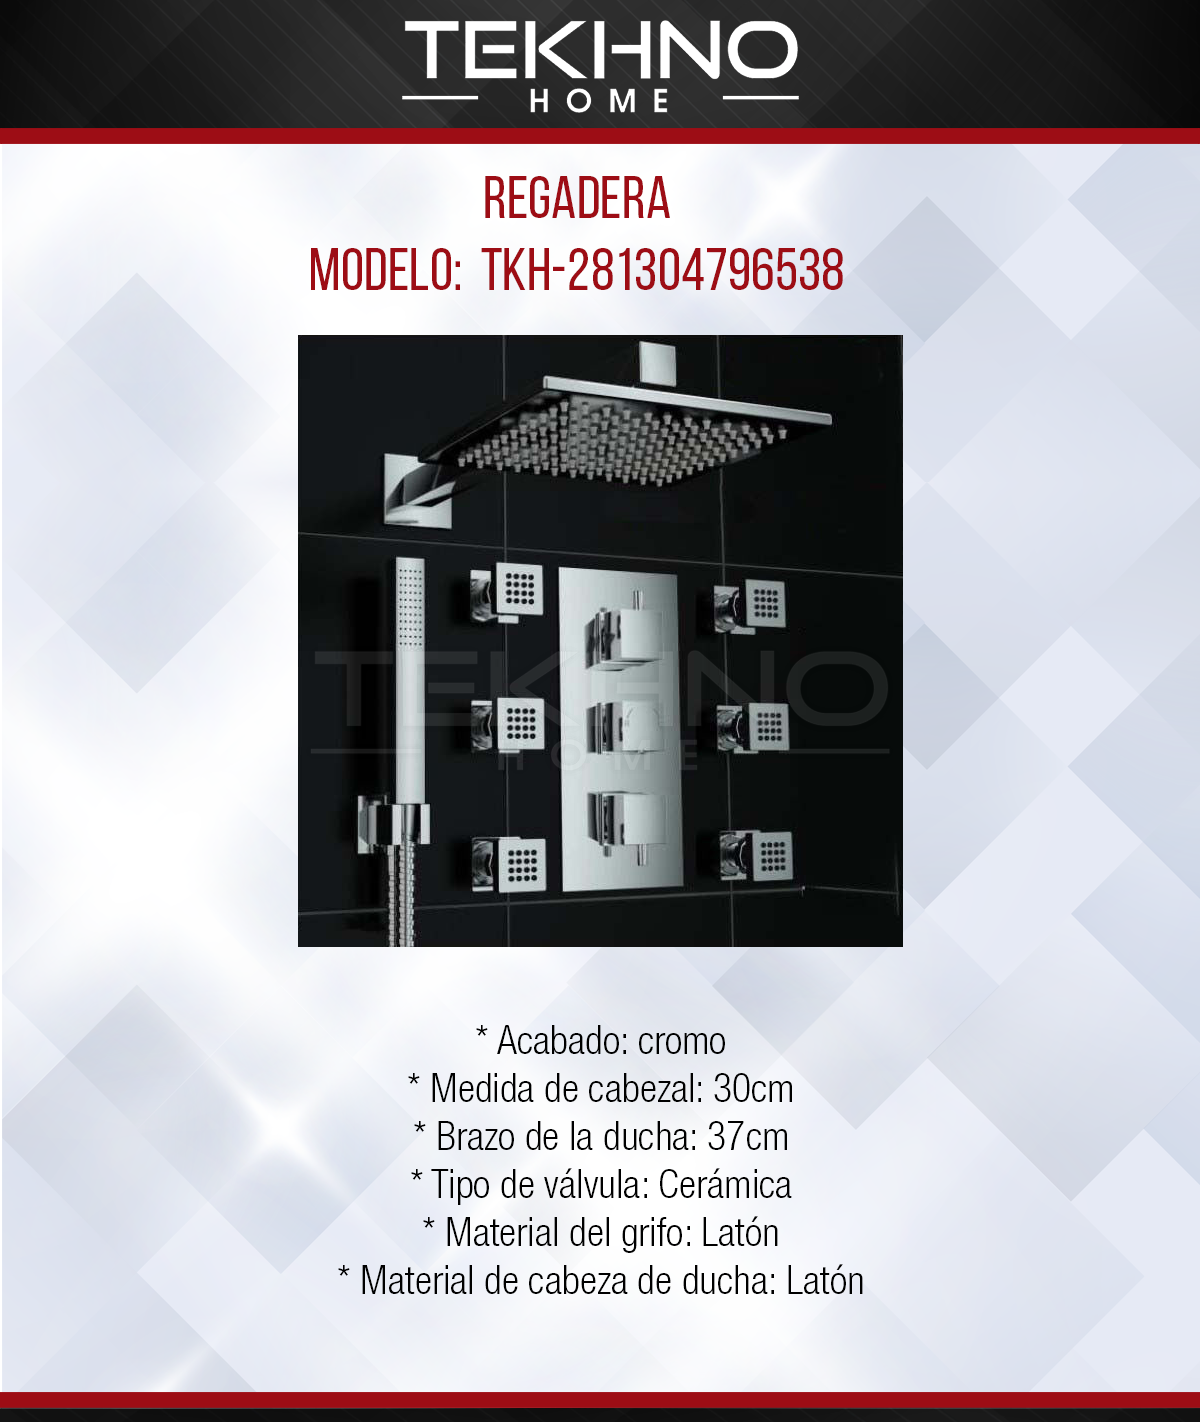 Regadera tkh-281304796538